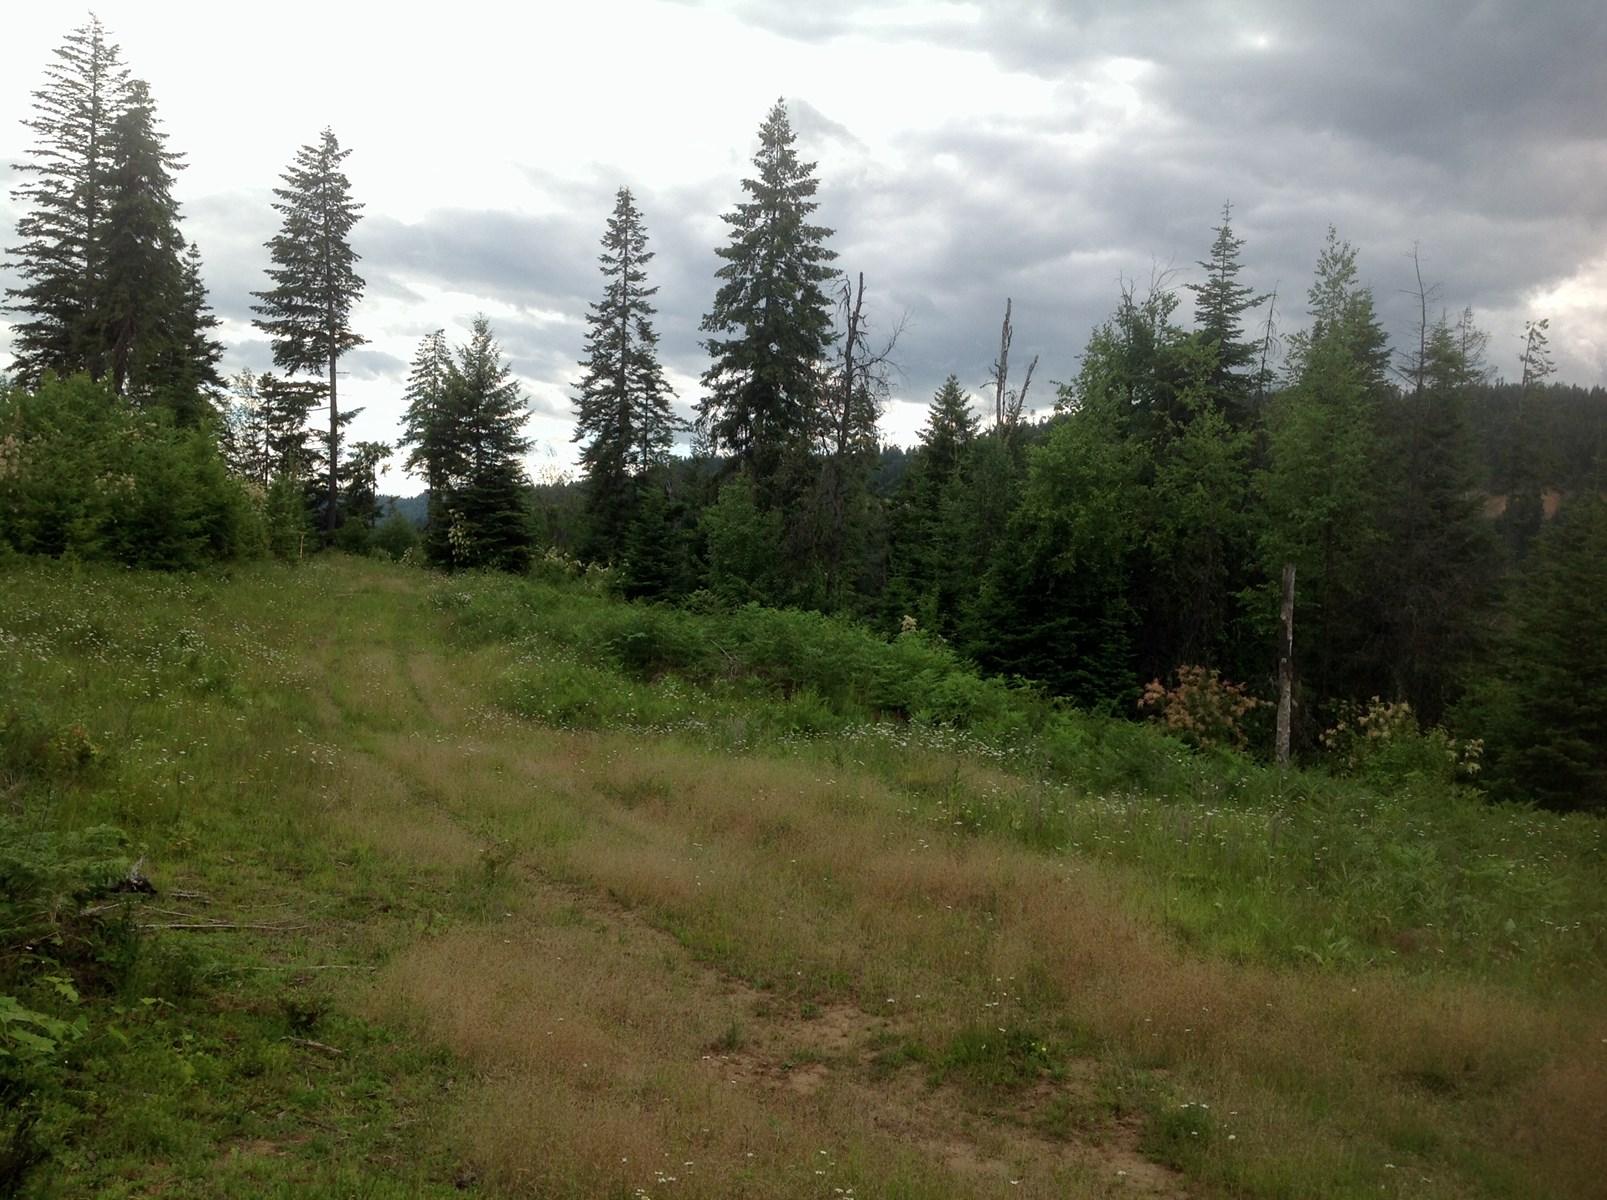 Building Site for sale close to Orofino, Idaho